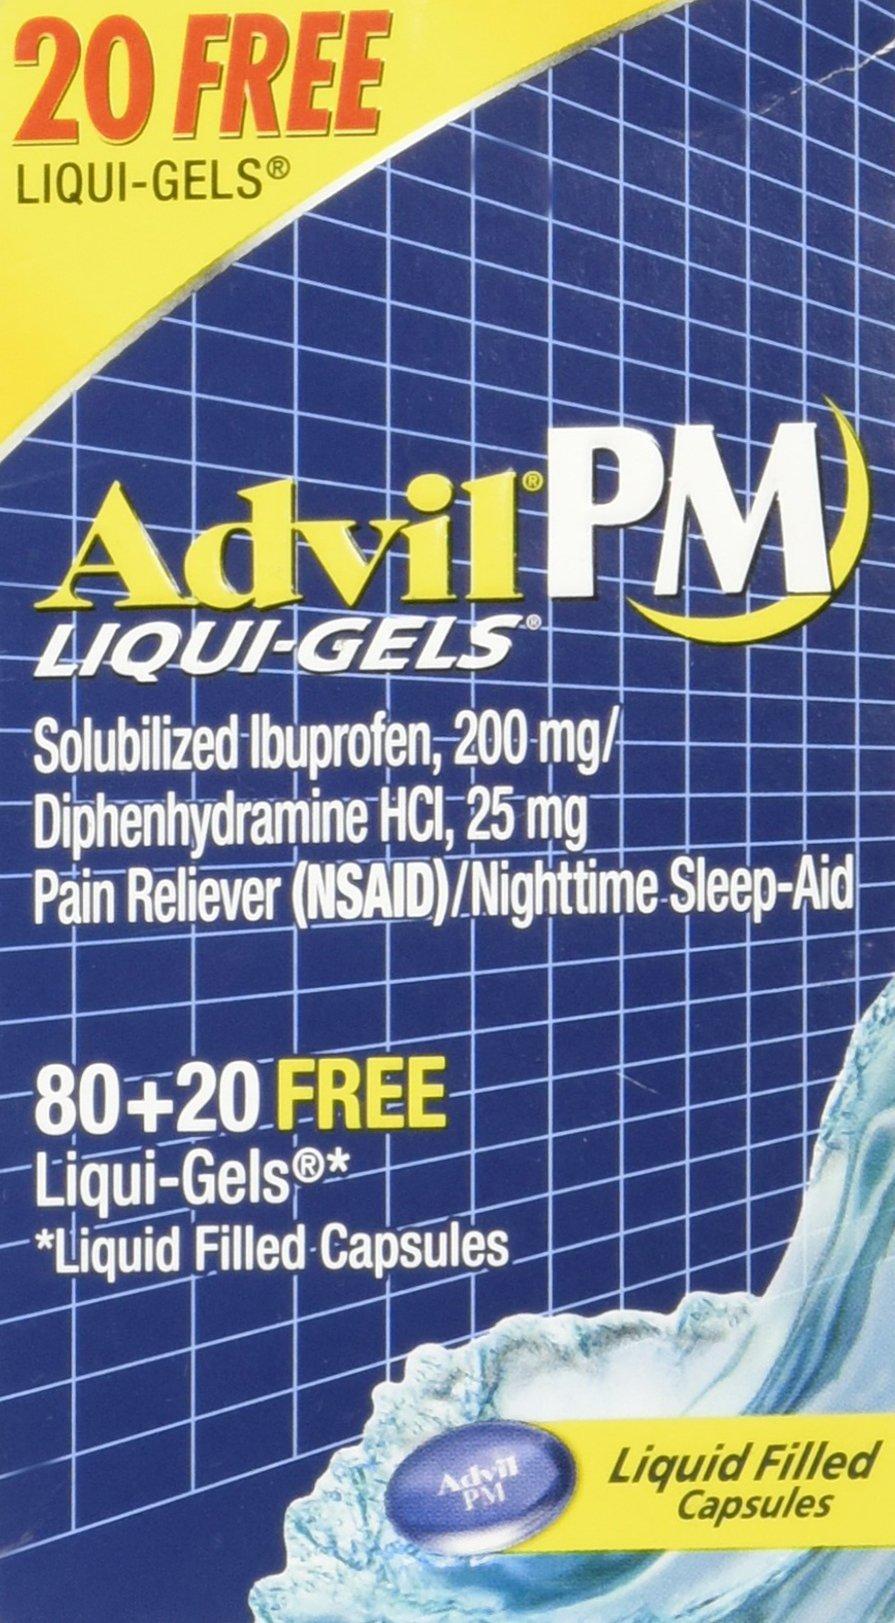 Advil PM Liqui-Gels 80 + 20 (Total of 100)Liquid Filled Capsules